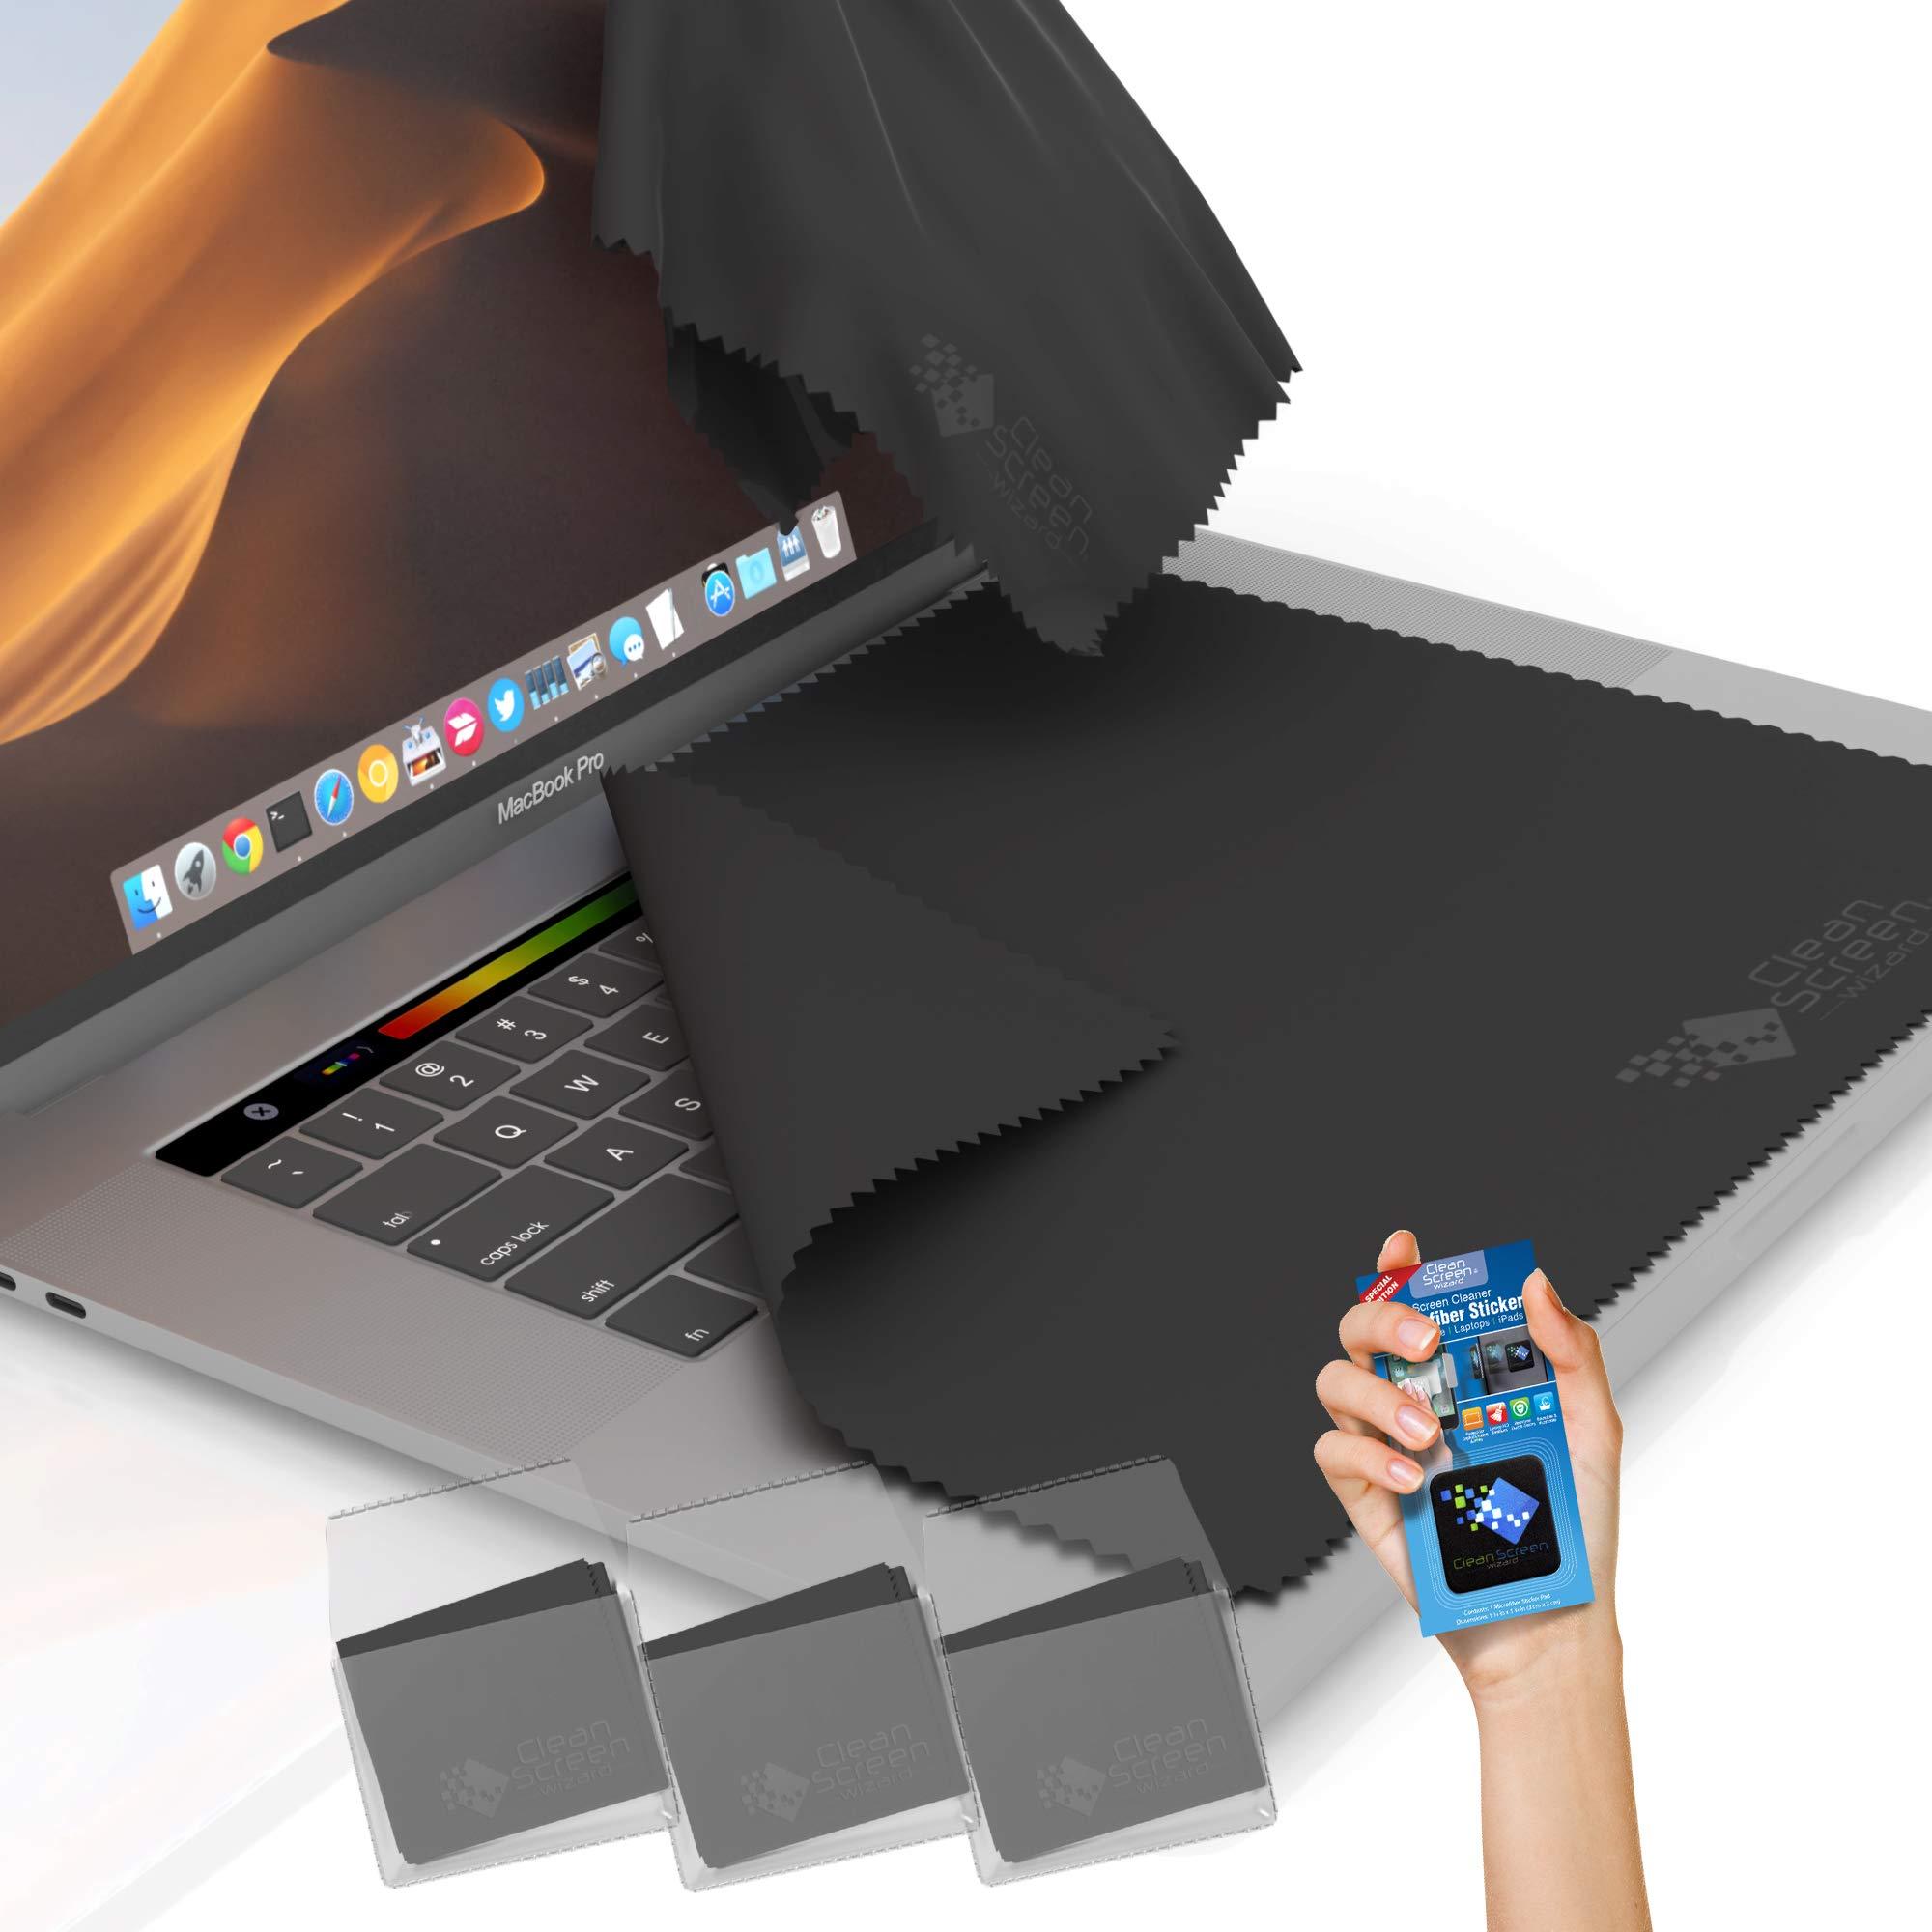 CLEAN SCREEN WIZARD Microfiber Screen Keyboard Cleaner Keyboard Screen Protector, XL Cloths Keyboard Covers/Screen Imprint Protection and Microfiber Sticker for 15 inch, 16 inch MacBook Pro Laptops